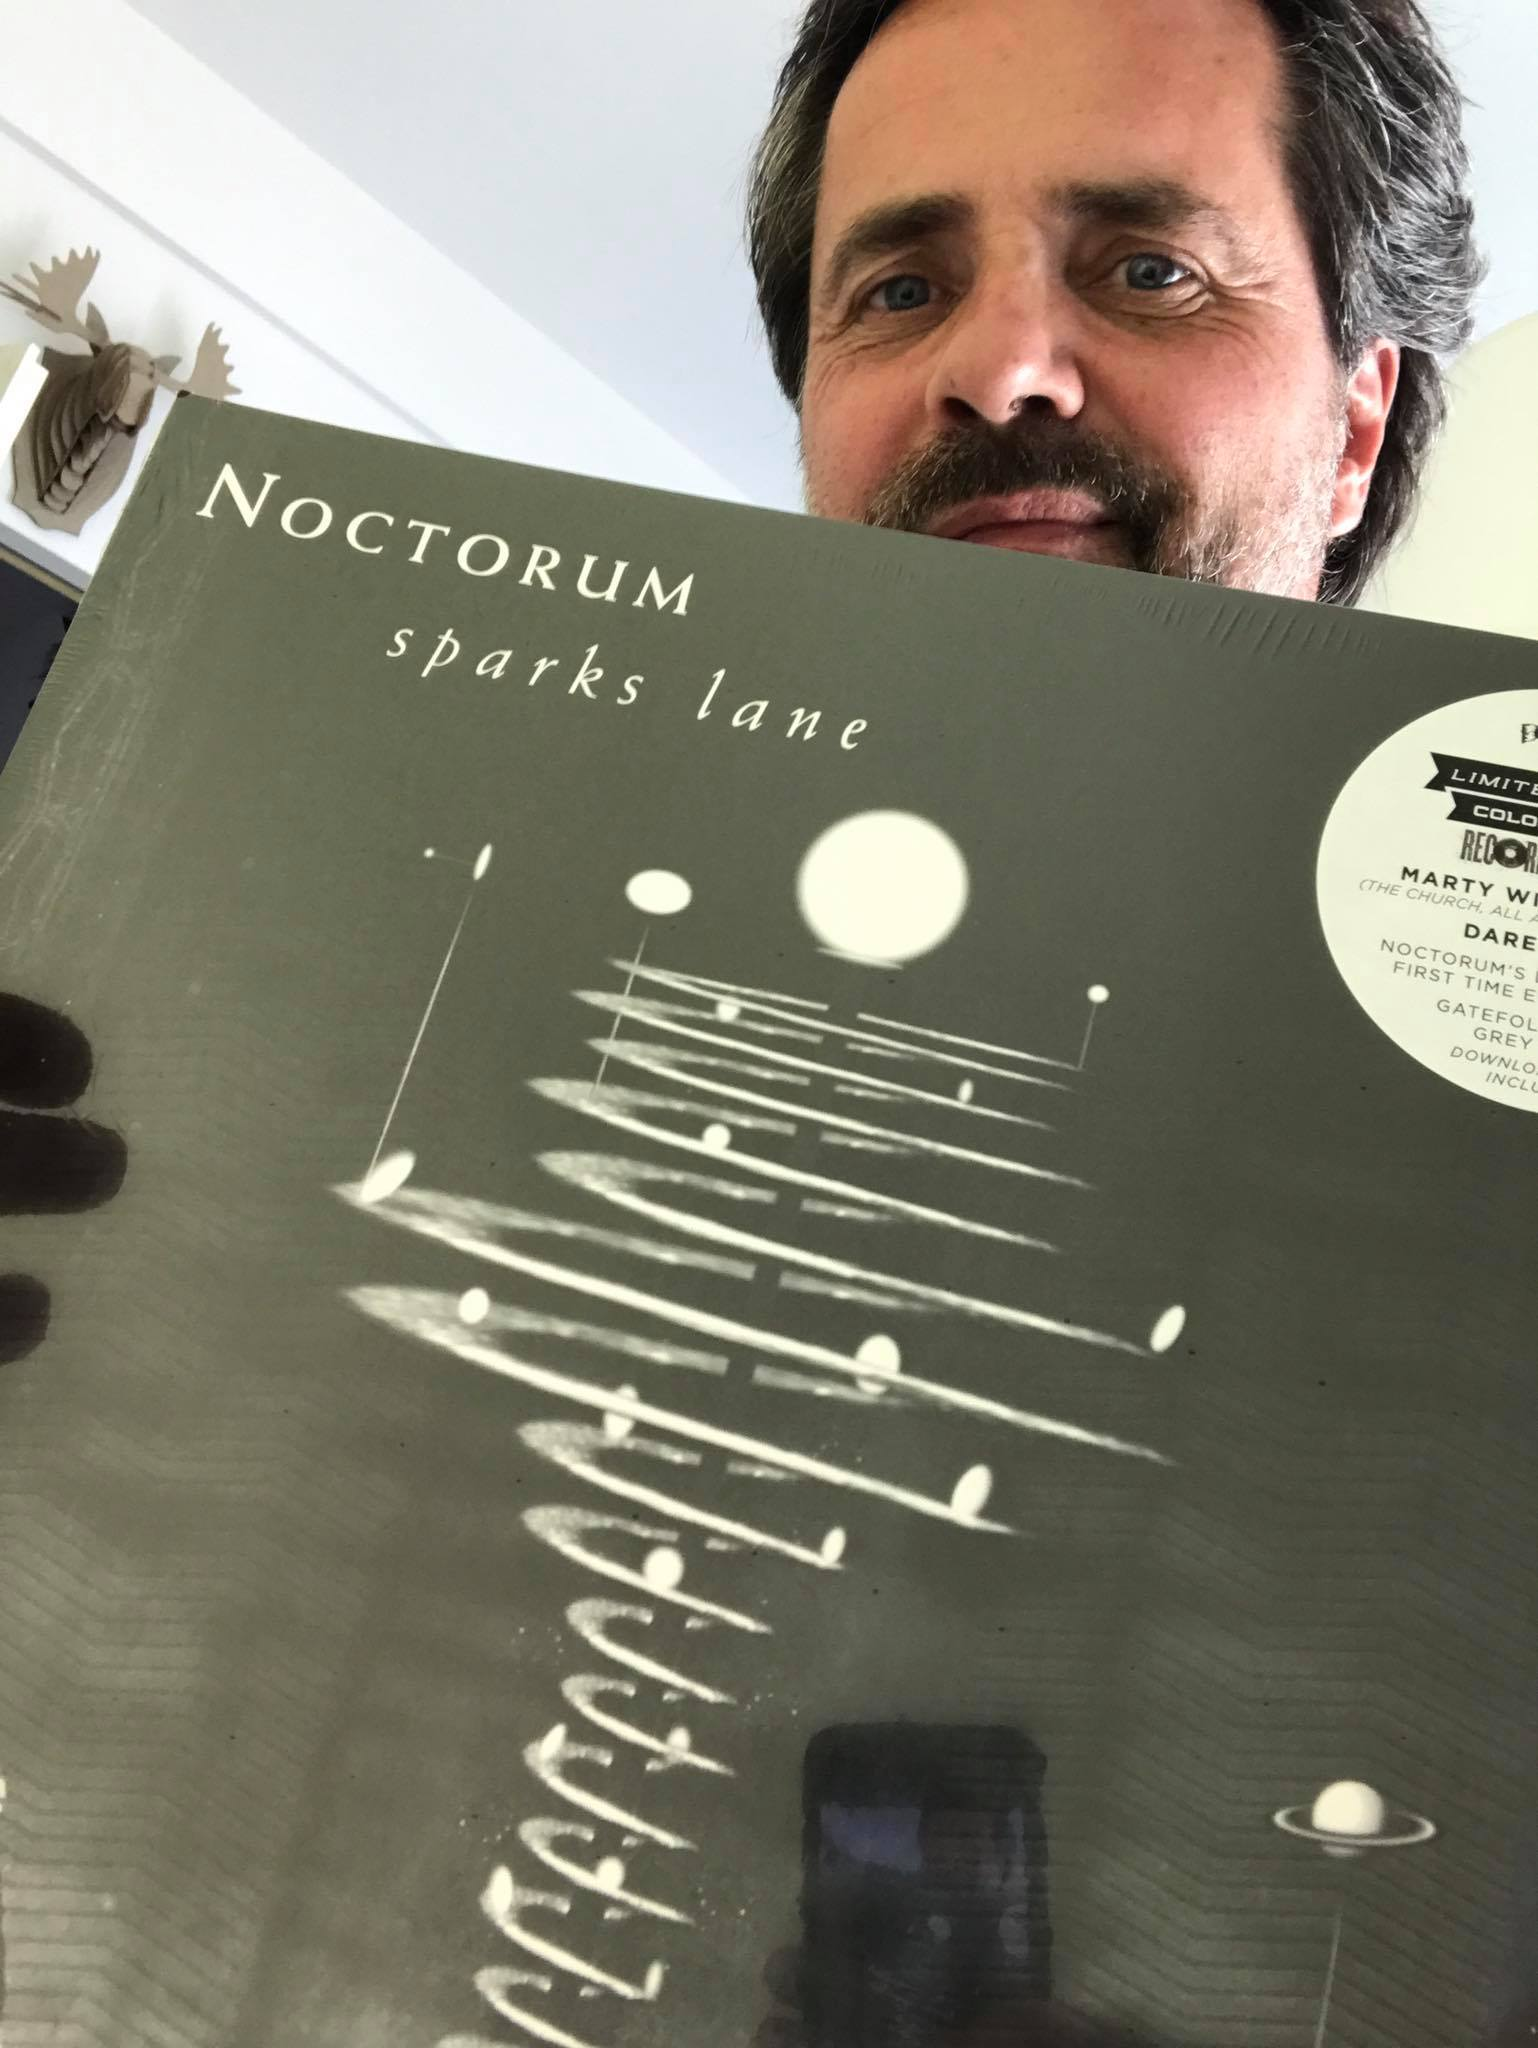 Noctorum - Sparks Lane (Marty Willson-Piper and Dare Mason)